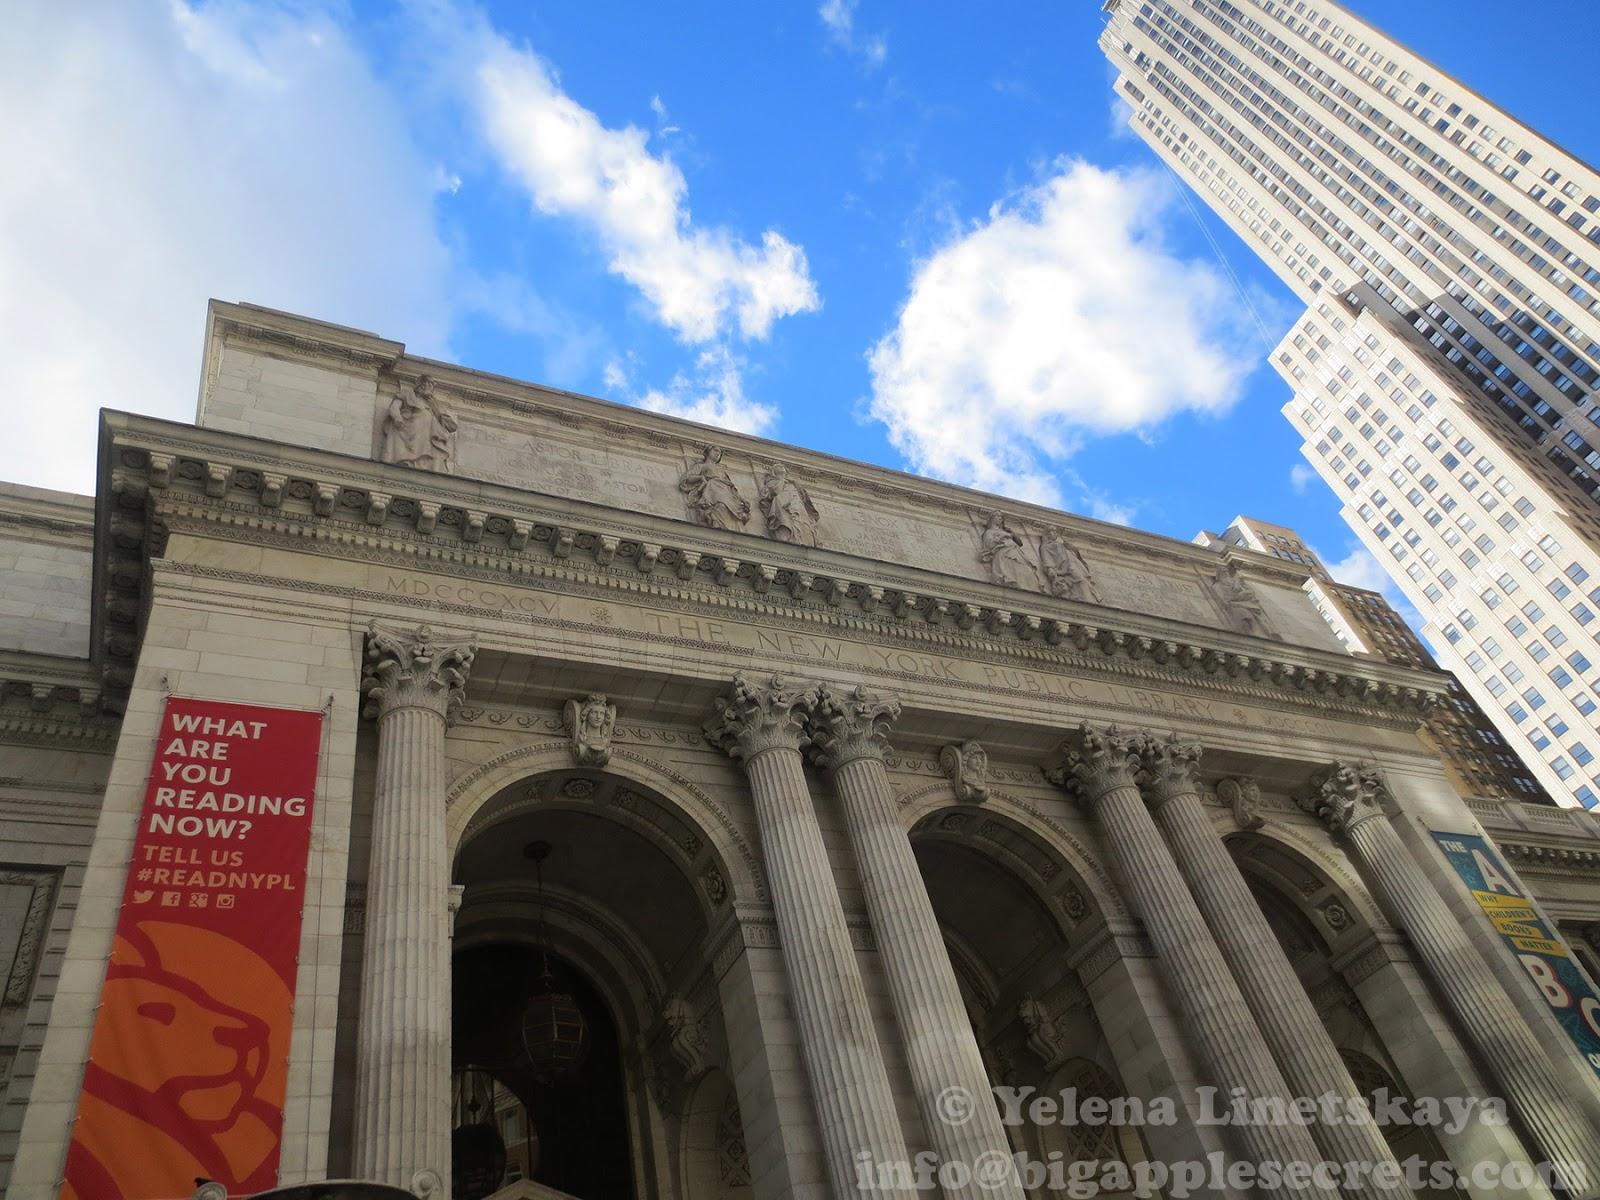 D Printing Exhibition New York : Big apple secrets printing women exhibition in new york